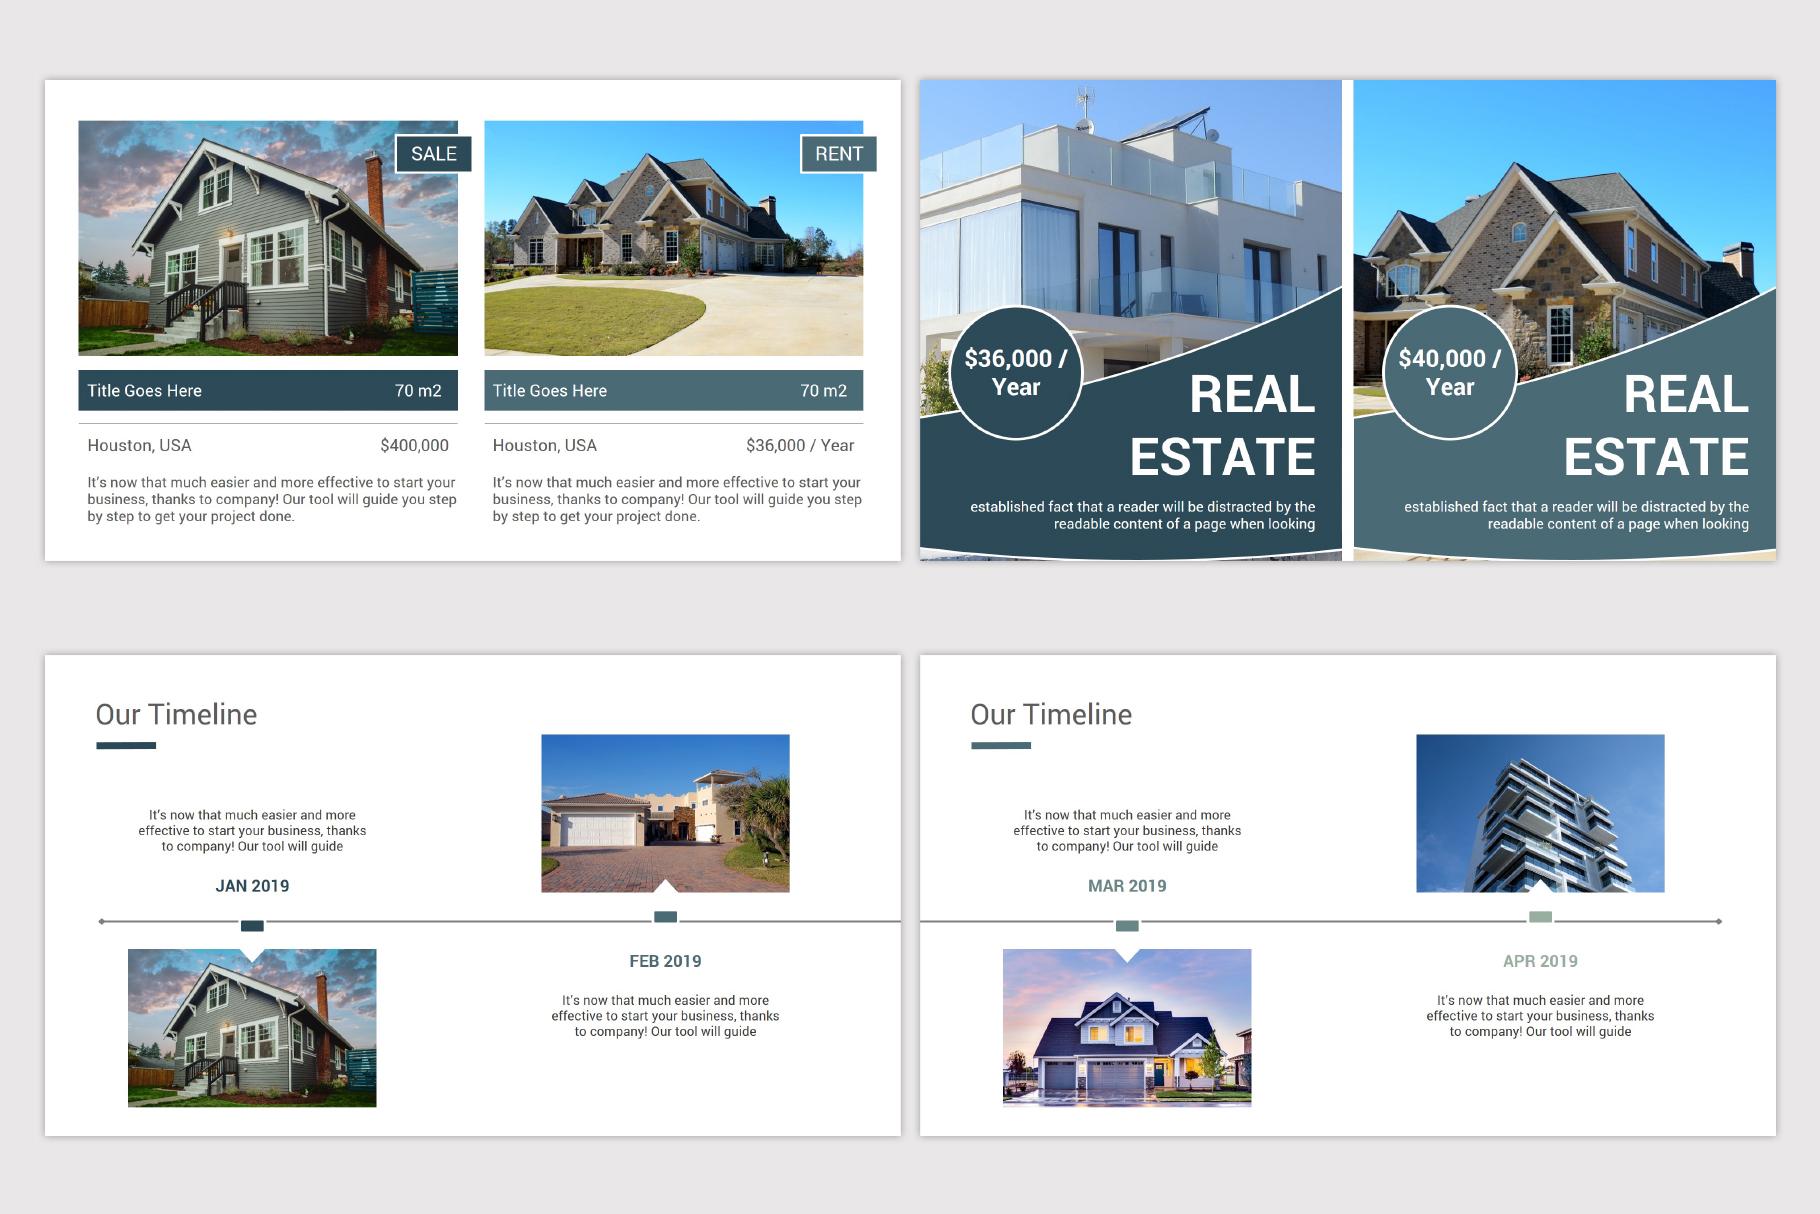 Real Estate Google Slides Template example image 10